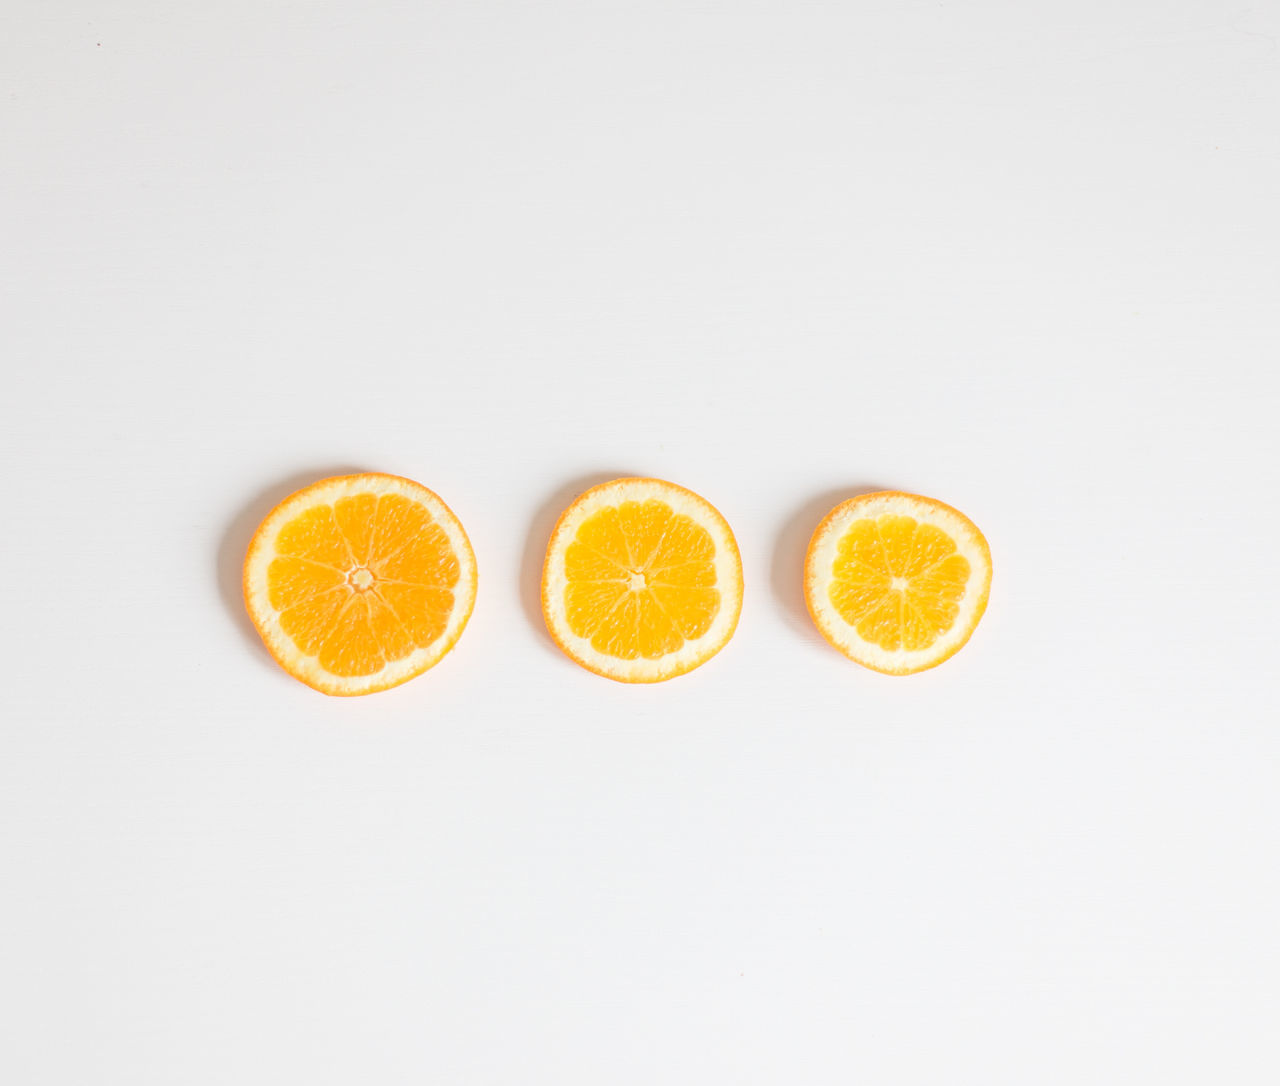 Beautiful stock photos of obst, fruit, slice, citrus fruit, white background